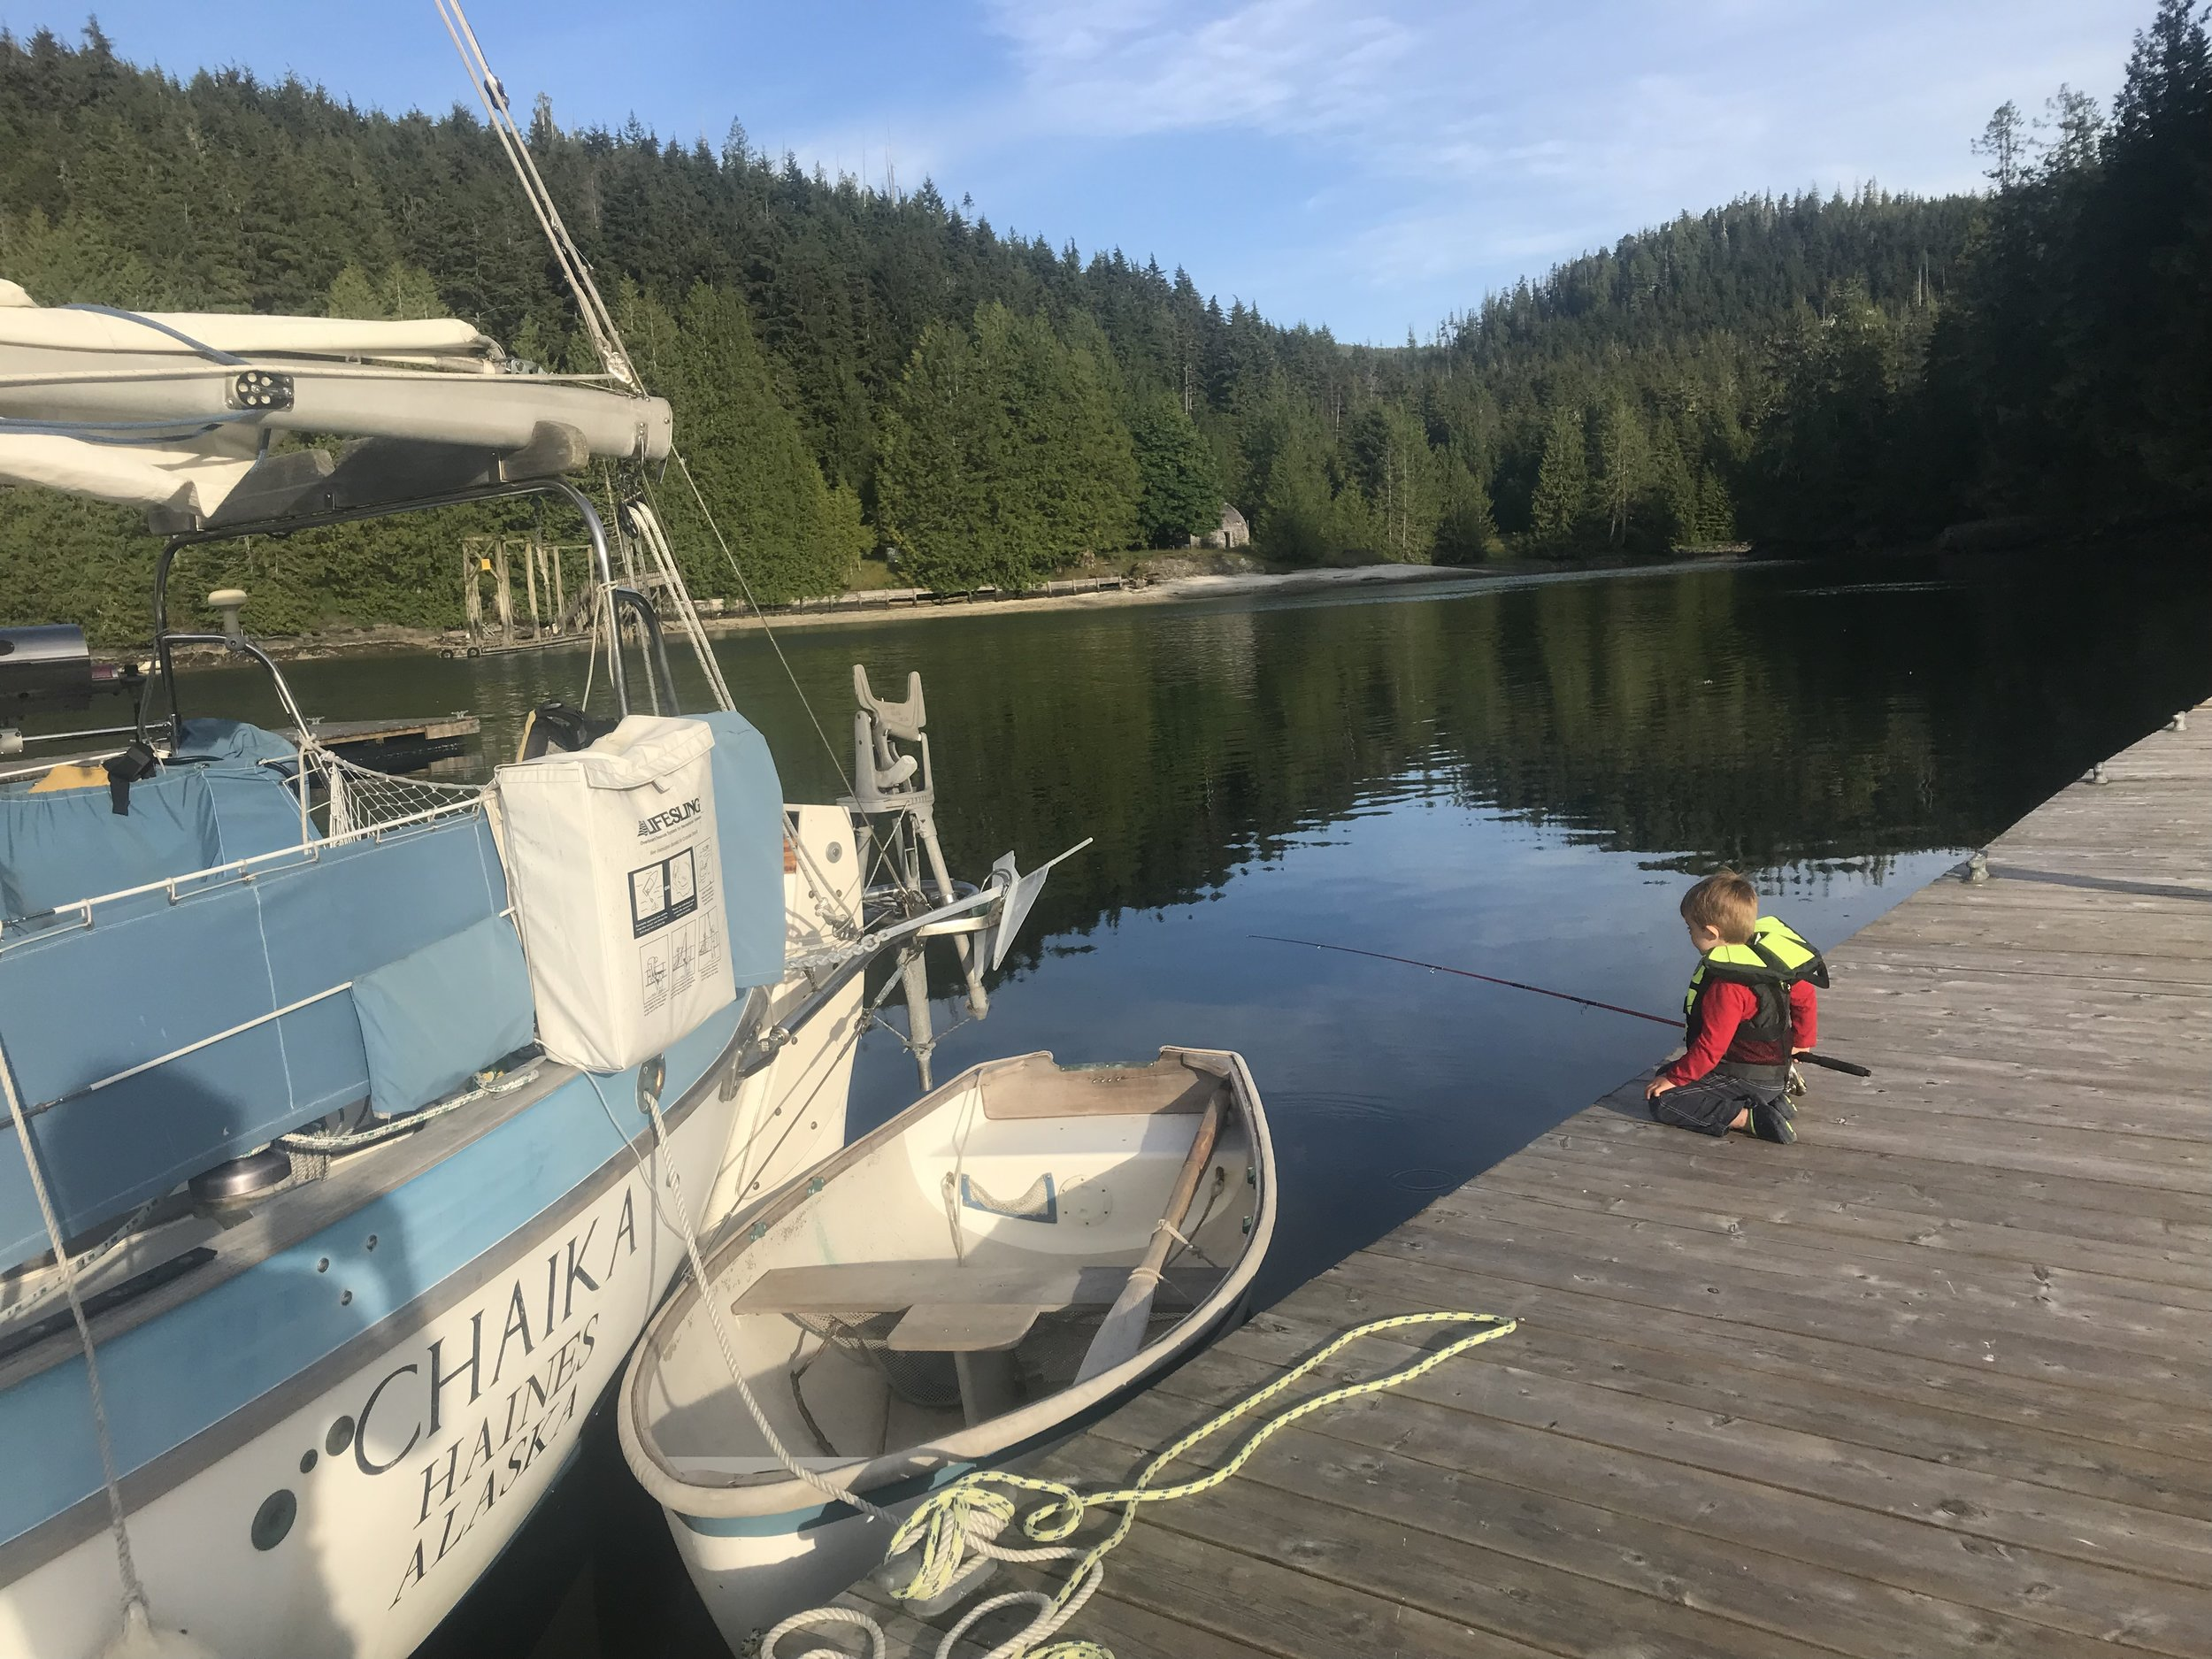 Fishing off the docks at Echo Bay.